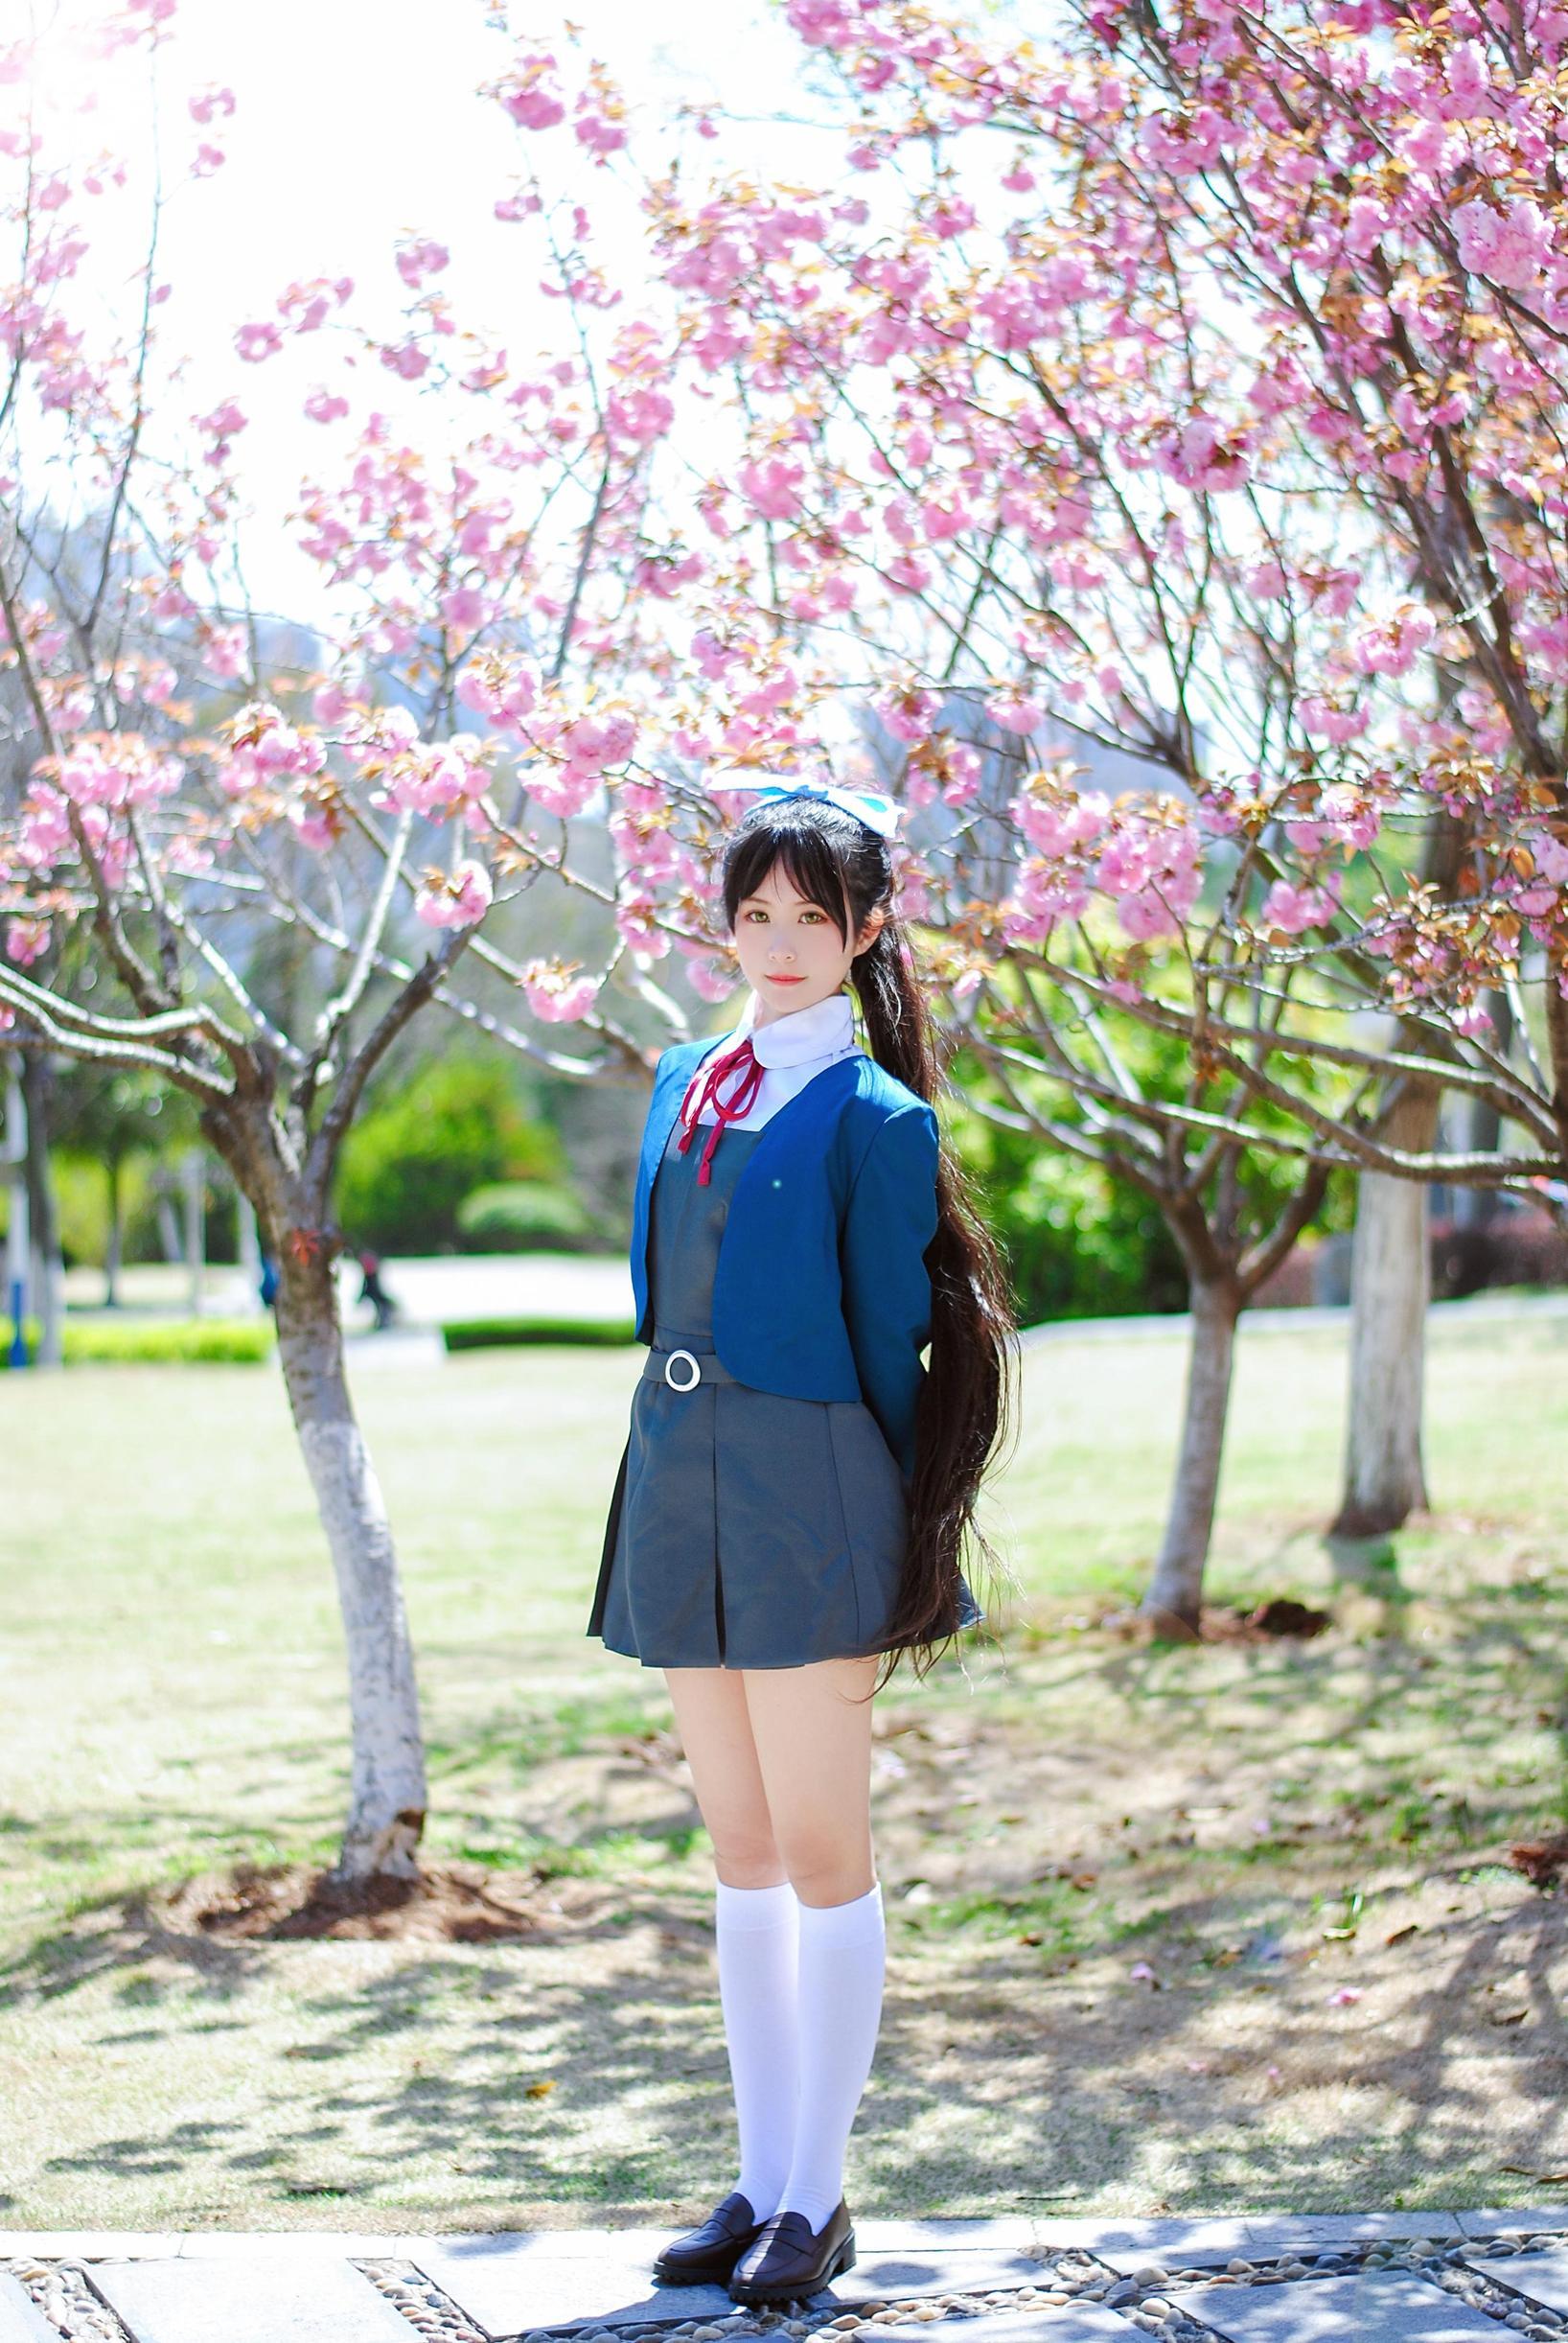 《LOVE LIVE!》美少女cosplay【CN:_李笑颜Lee】-第6张